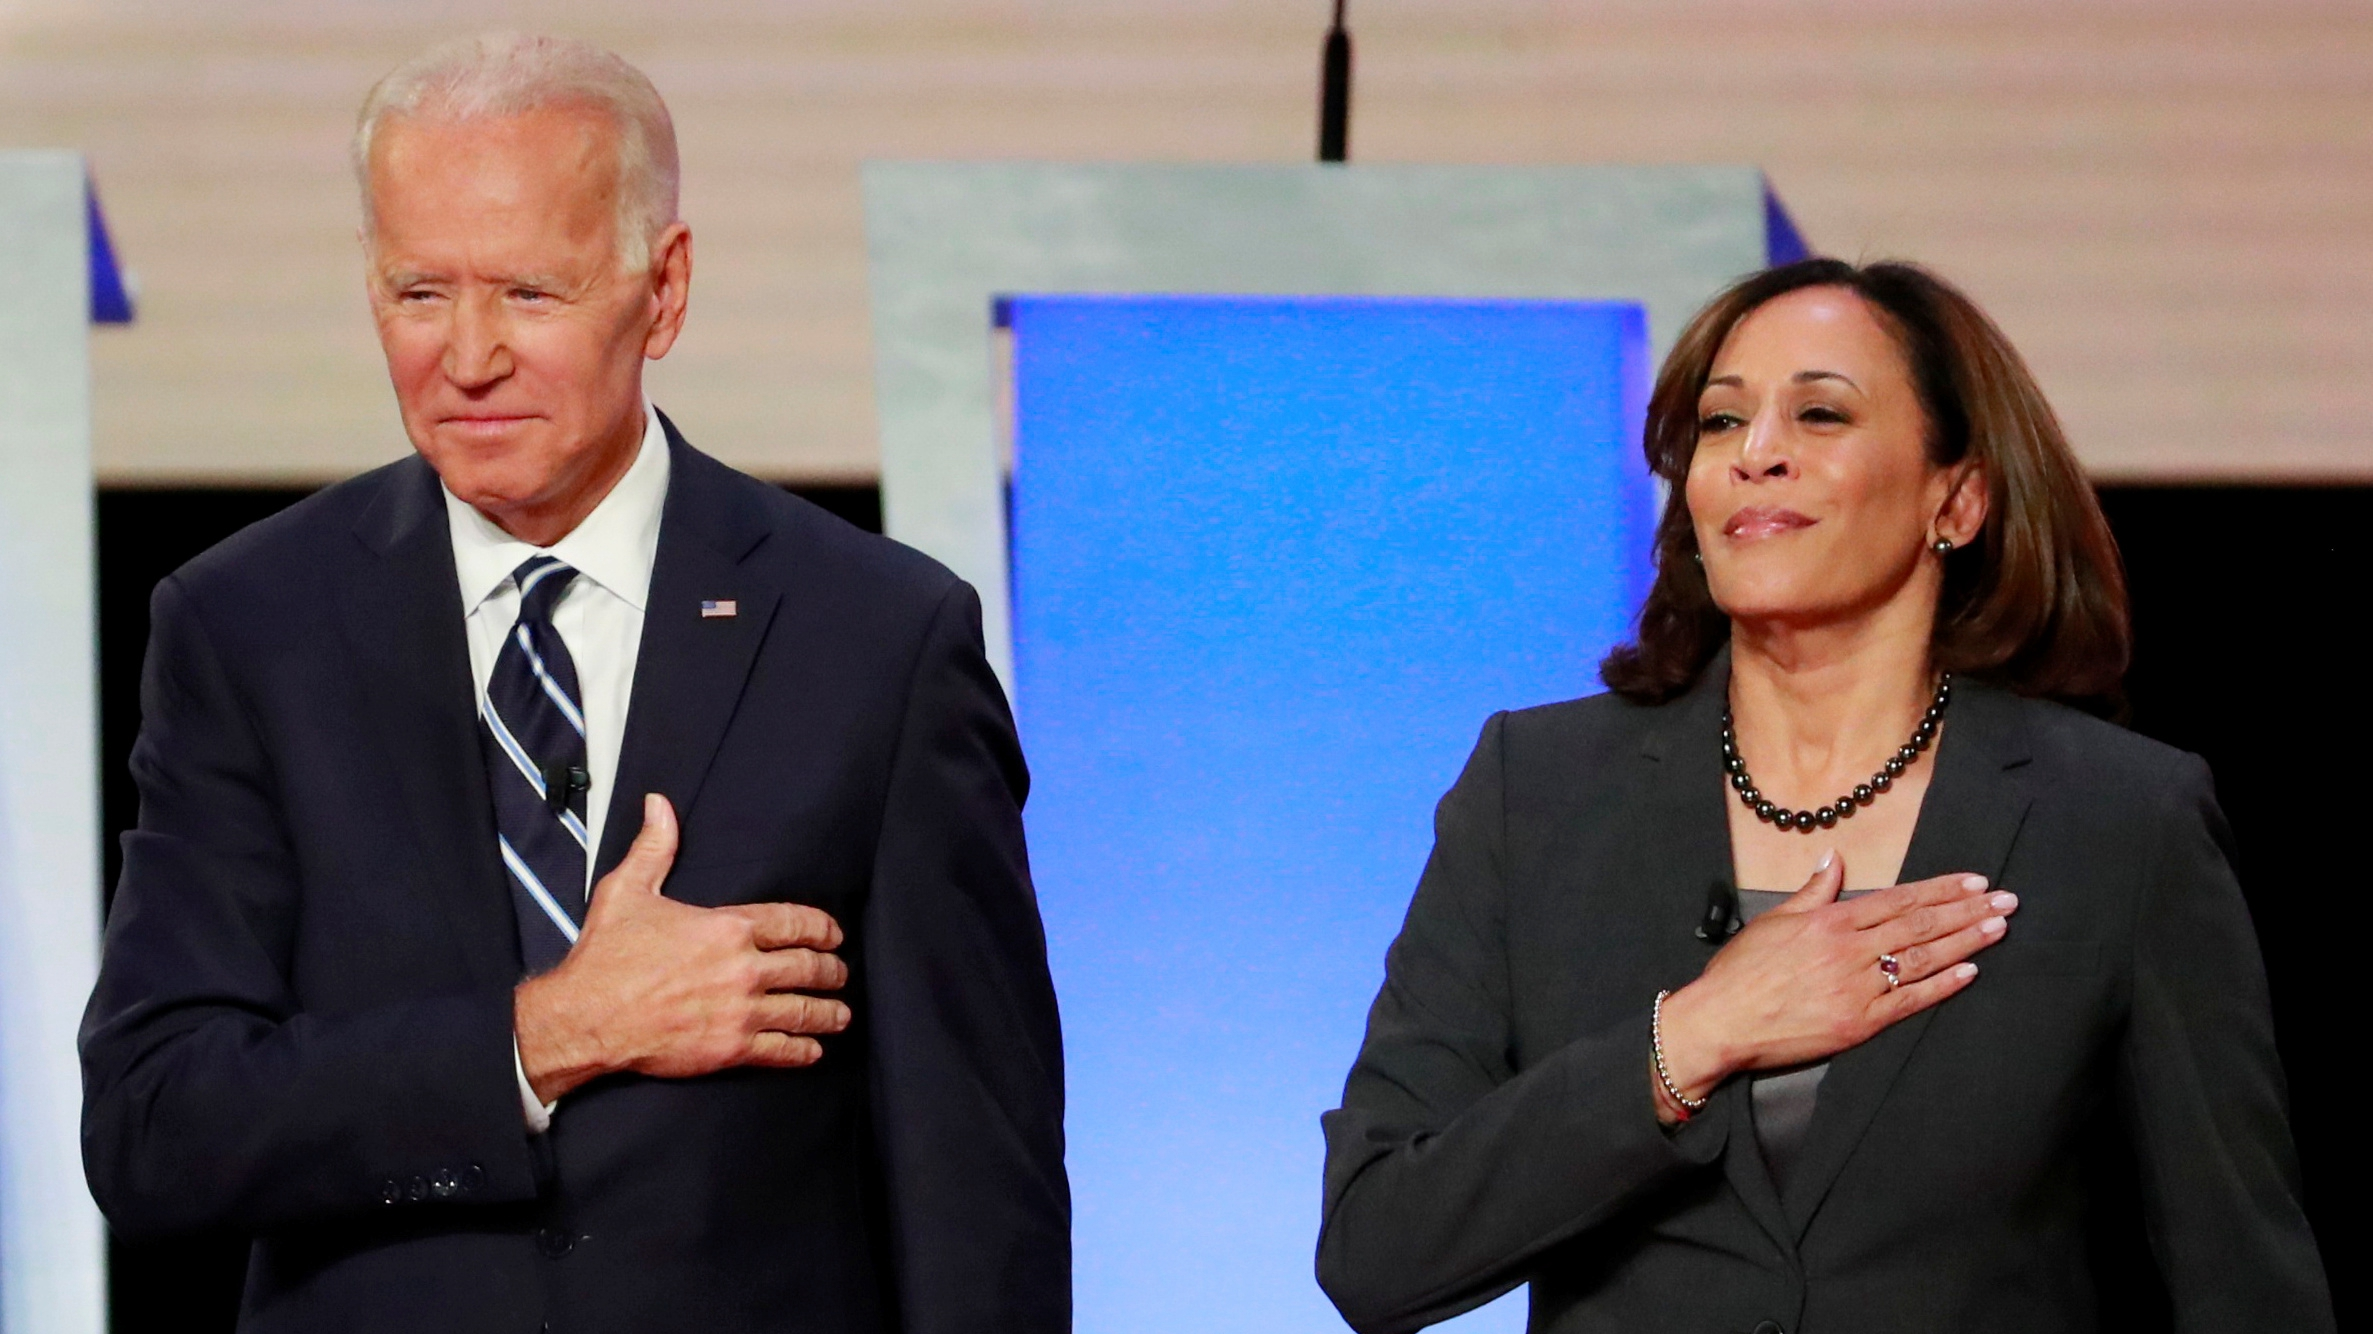 Biden Blasts Trump For Abhorrent Birther Rhetoric On Harris Cgtn